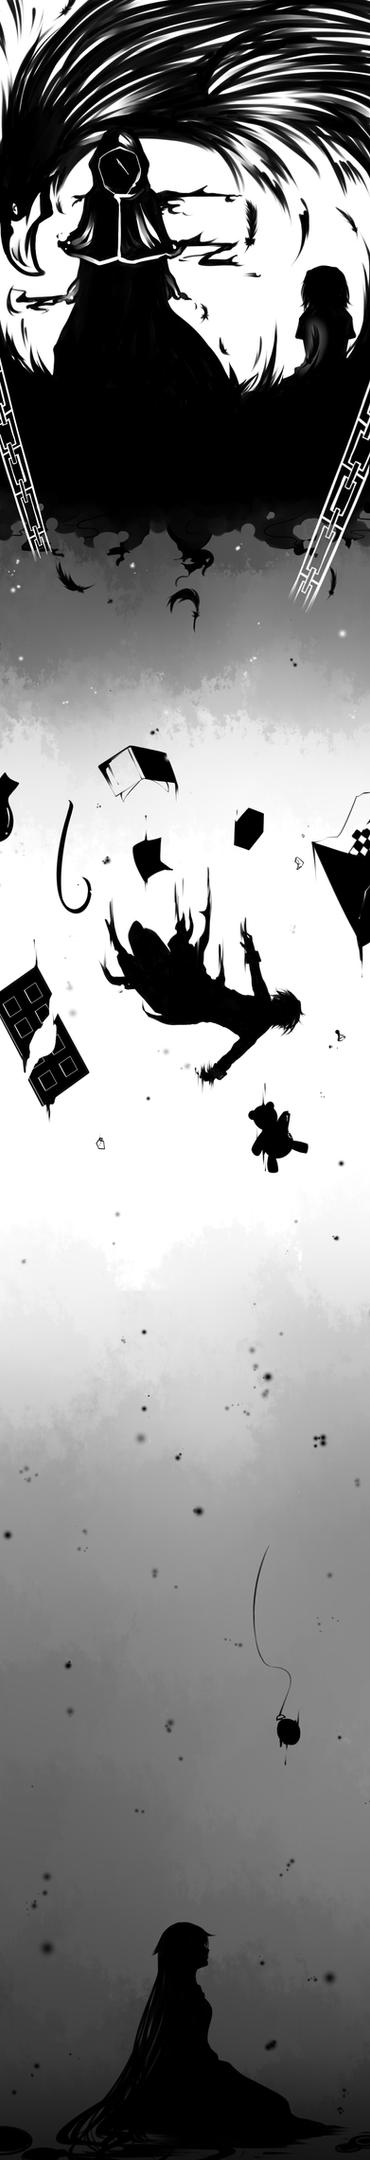 PH: Sinking Into Despair by tettere-ko